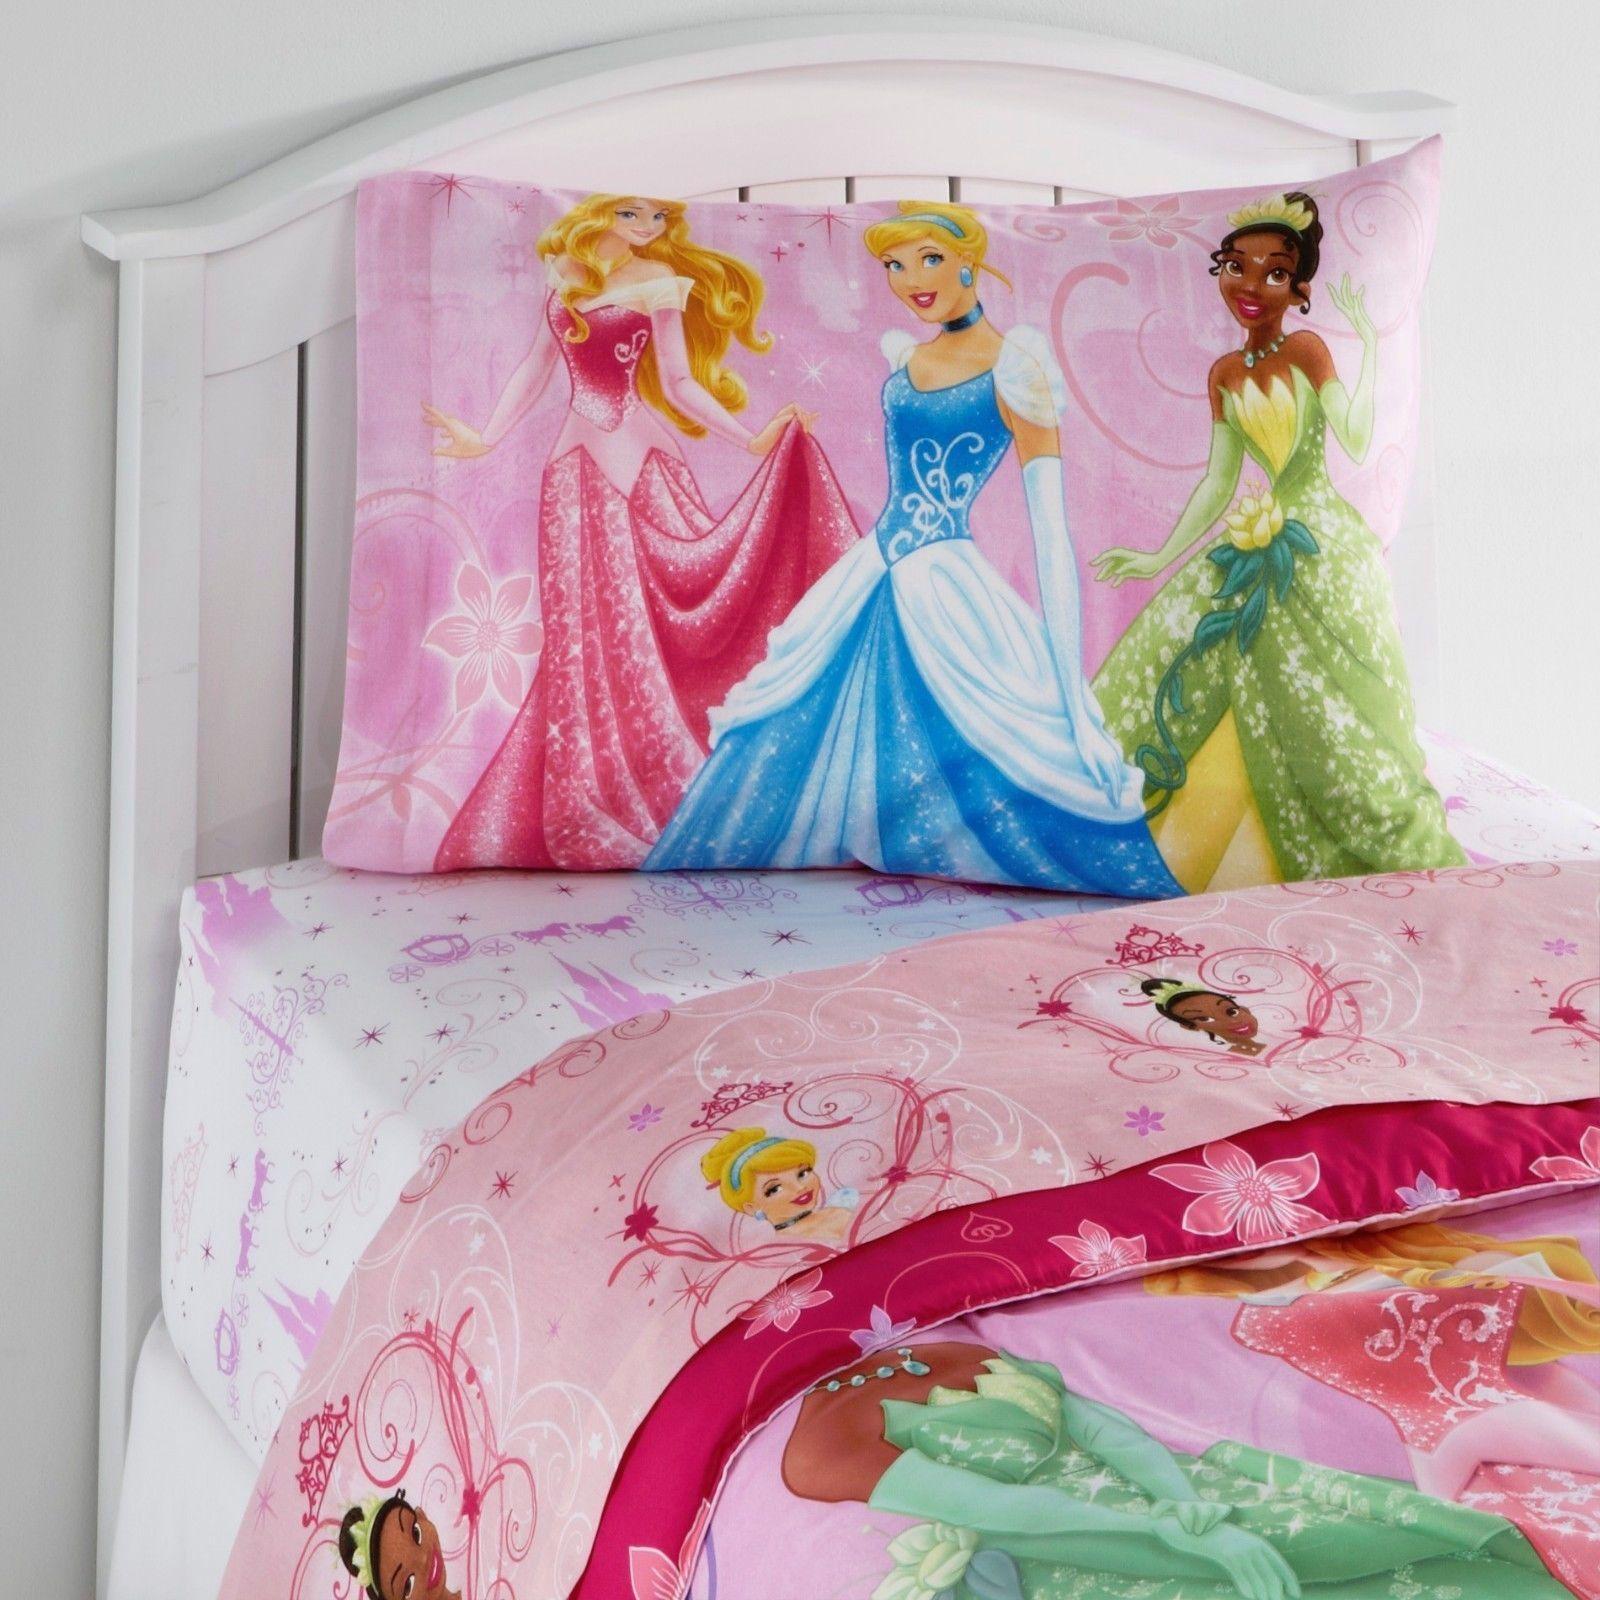 Kids Disney Princess Girlu0027s Twin Bed Bedding Sheet Pillowcase Set Kids